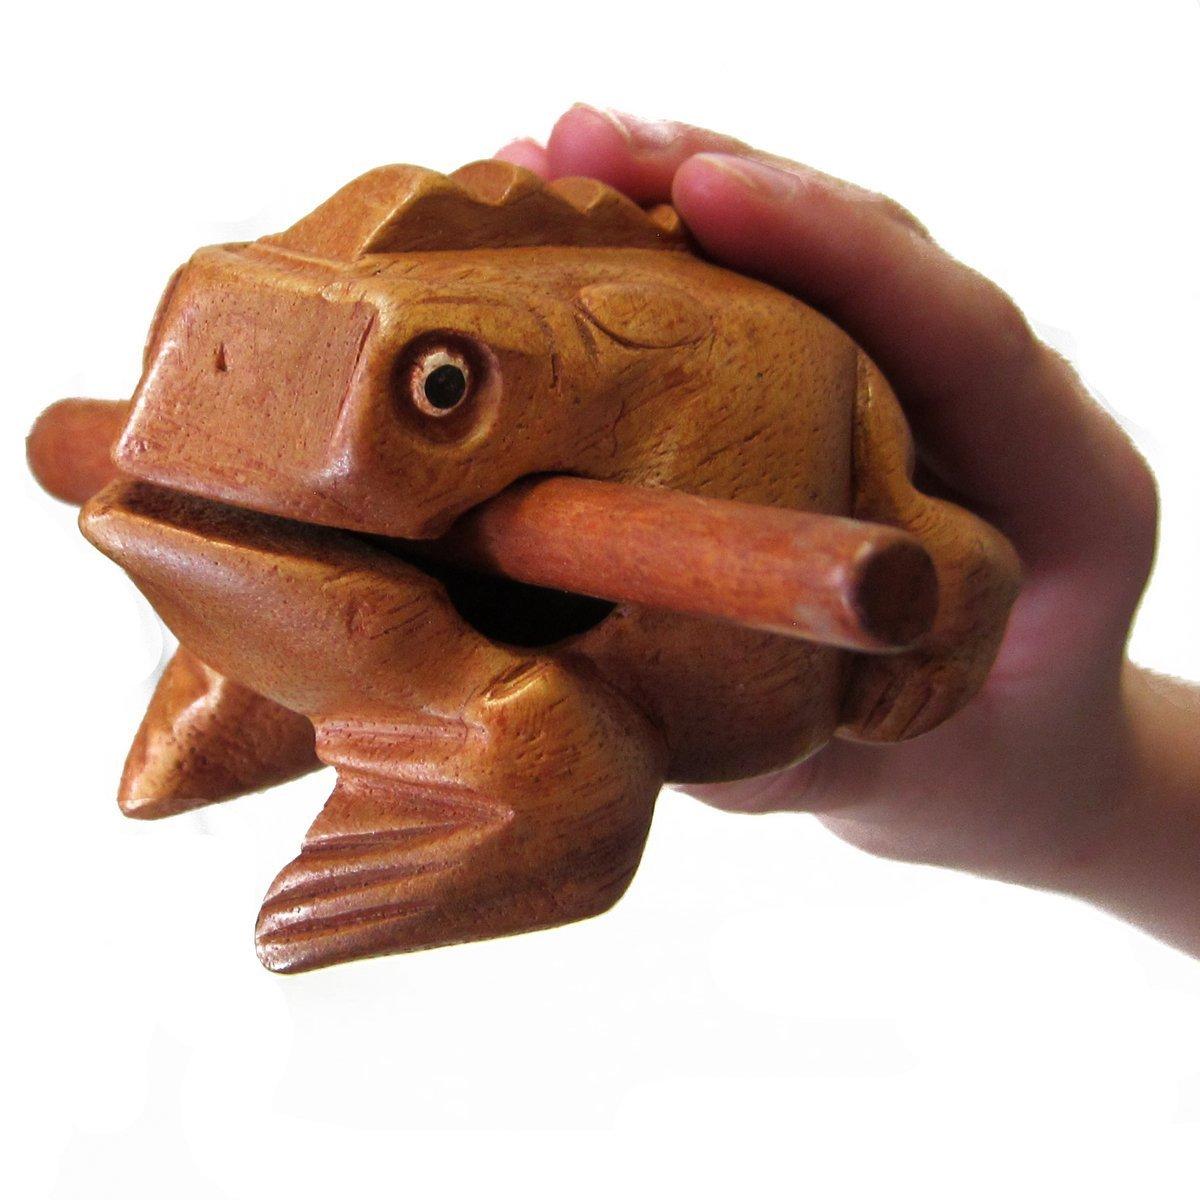 Wooden Frog Guiro - Fun Wooden Frog Percussion Instrument - Walmart.com